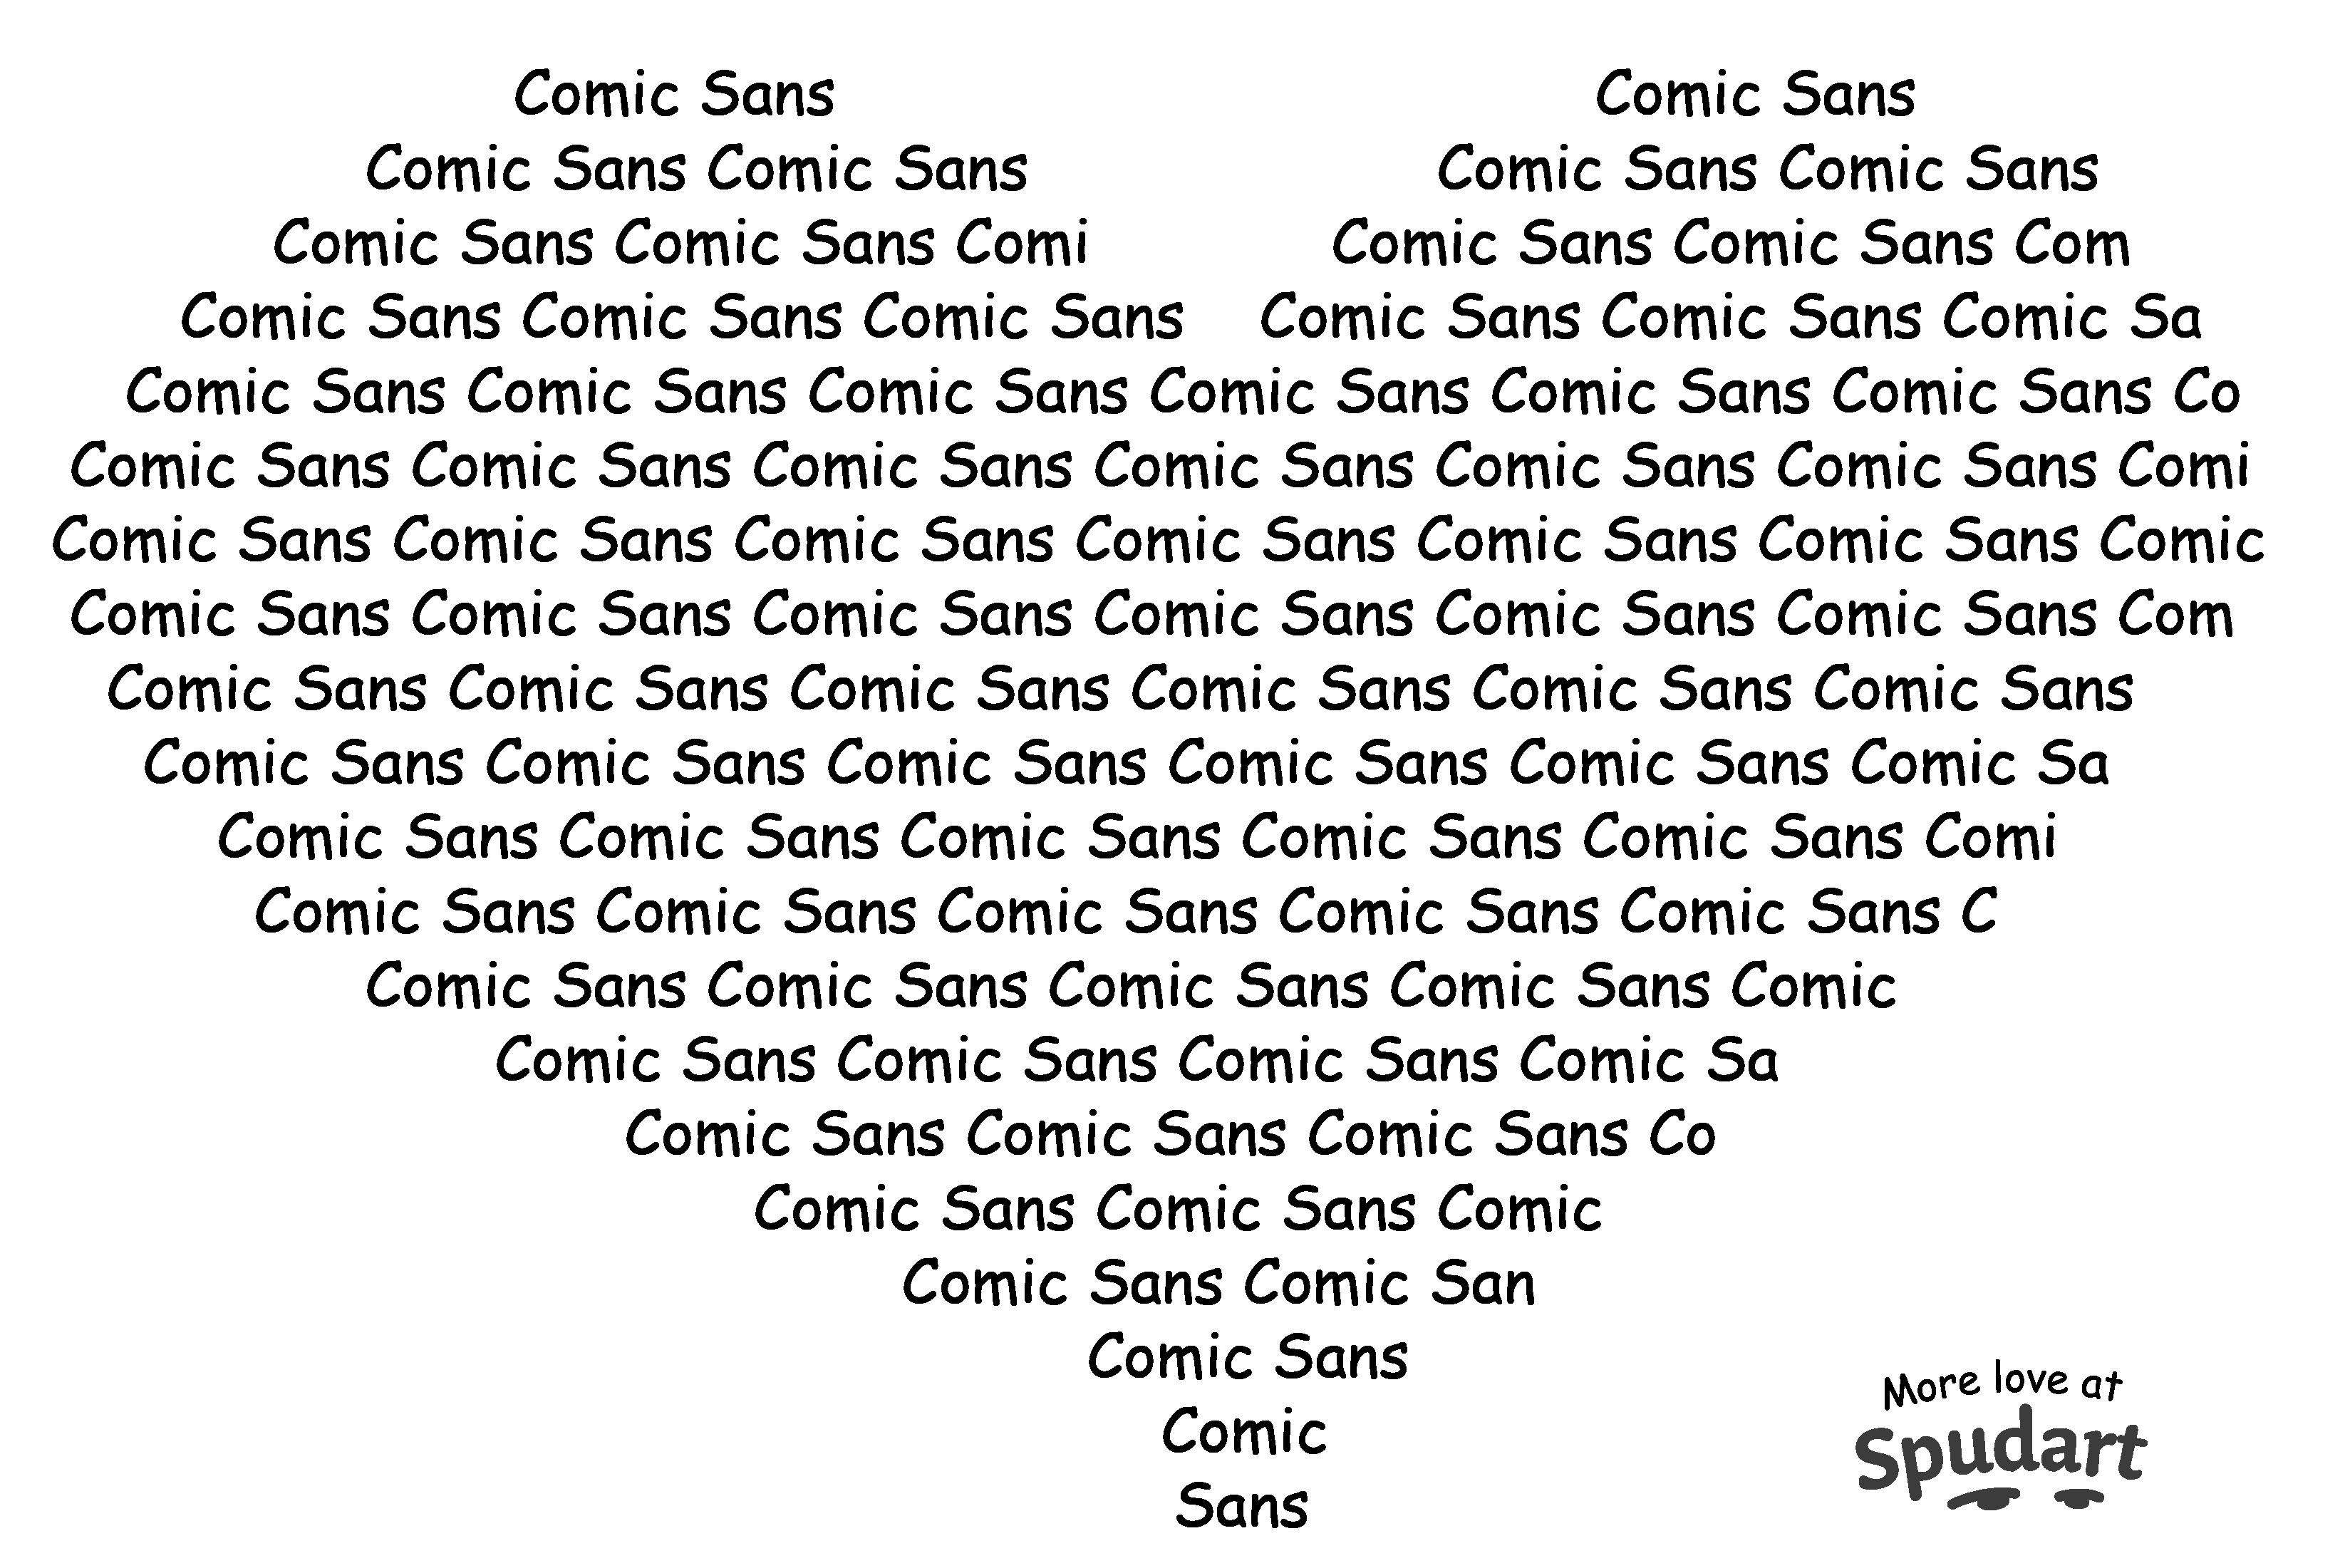 ASCII art heart with Comic Sans font